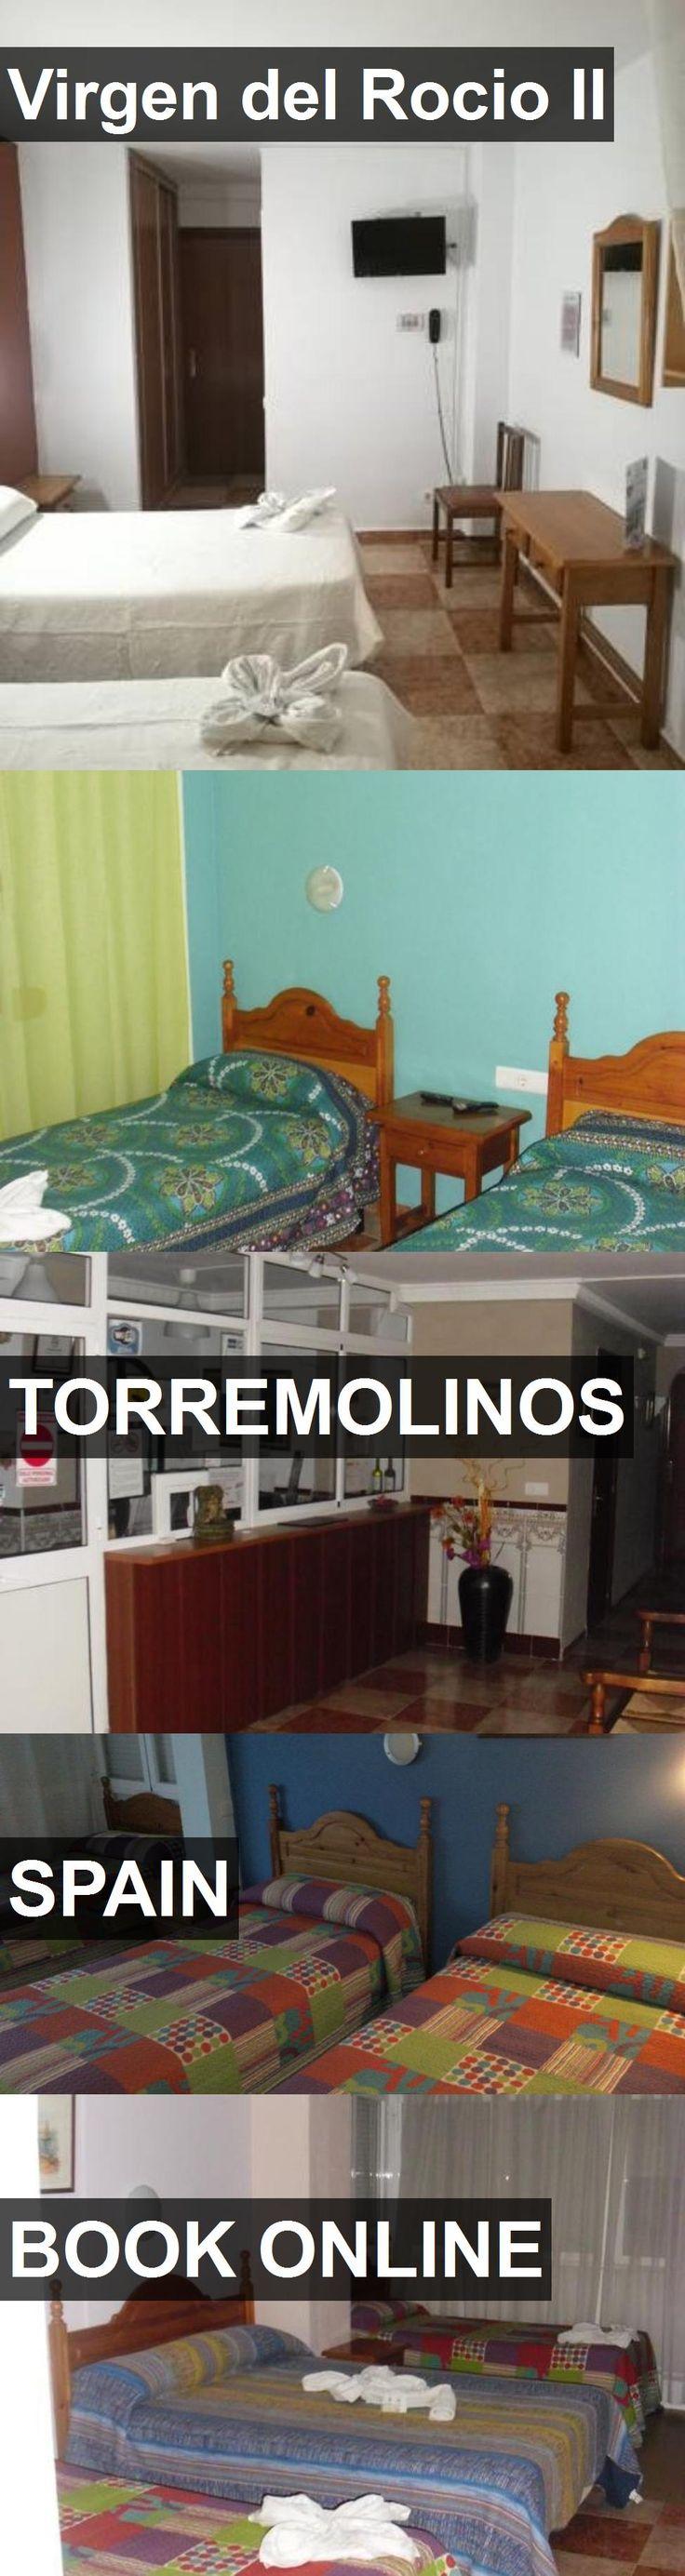 Hotel Virgen del Rocio II in Torremolinos, Spain. For more information, photos, reviews and best prices please follow the link. #Spain #Torremolinos #travel #vacation #hotel